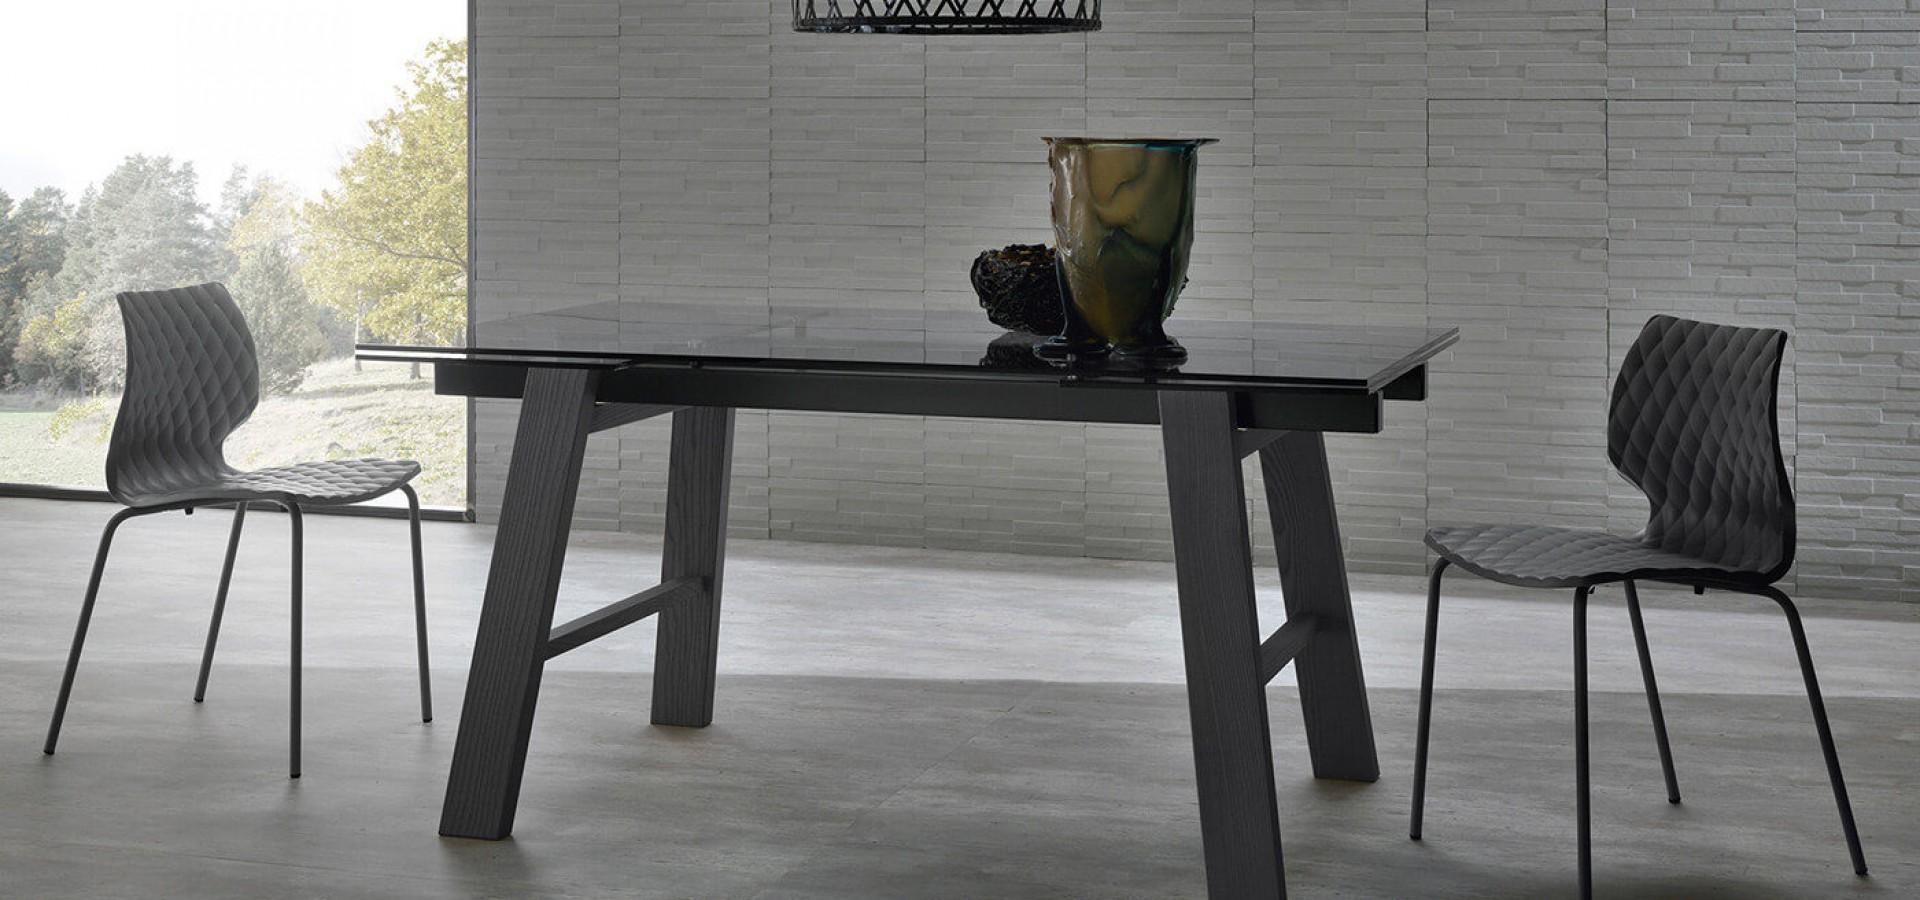 Итальянский стол ATELIER tavolo |